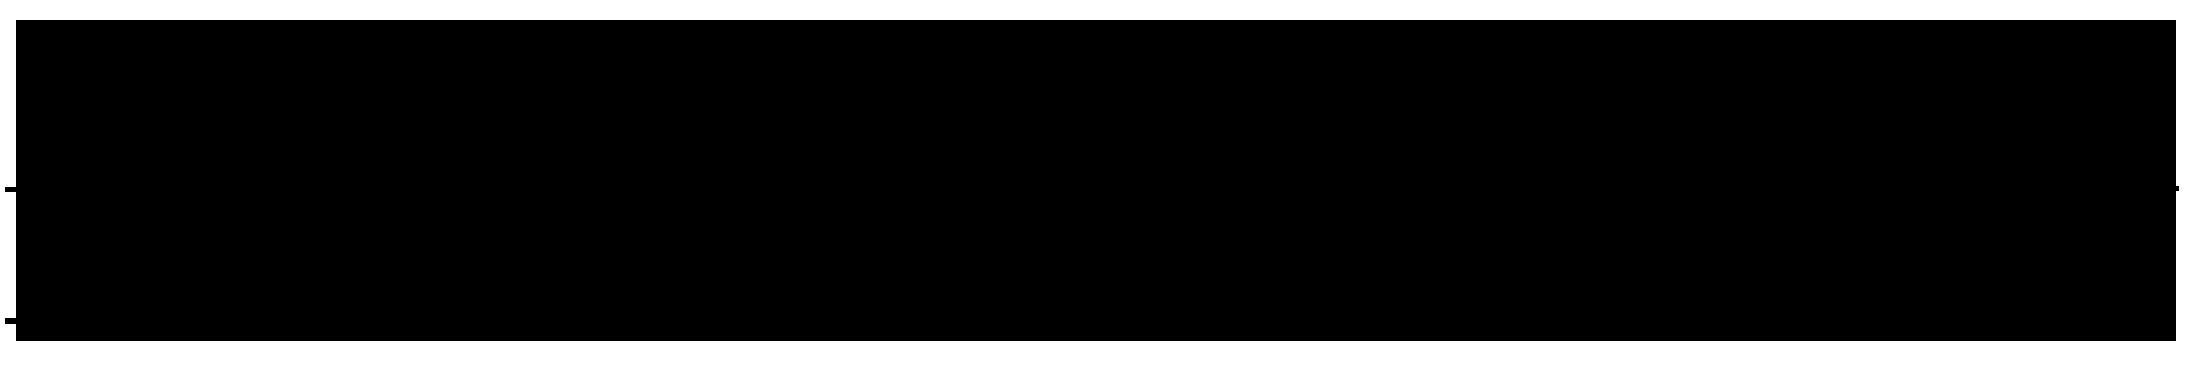 Black Falcon logo 2